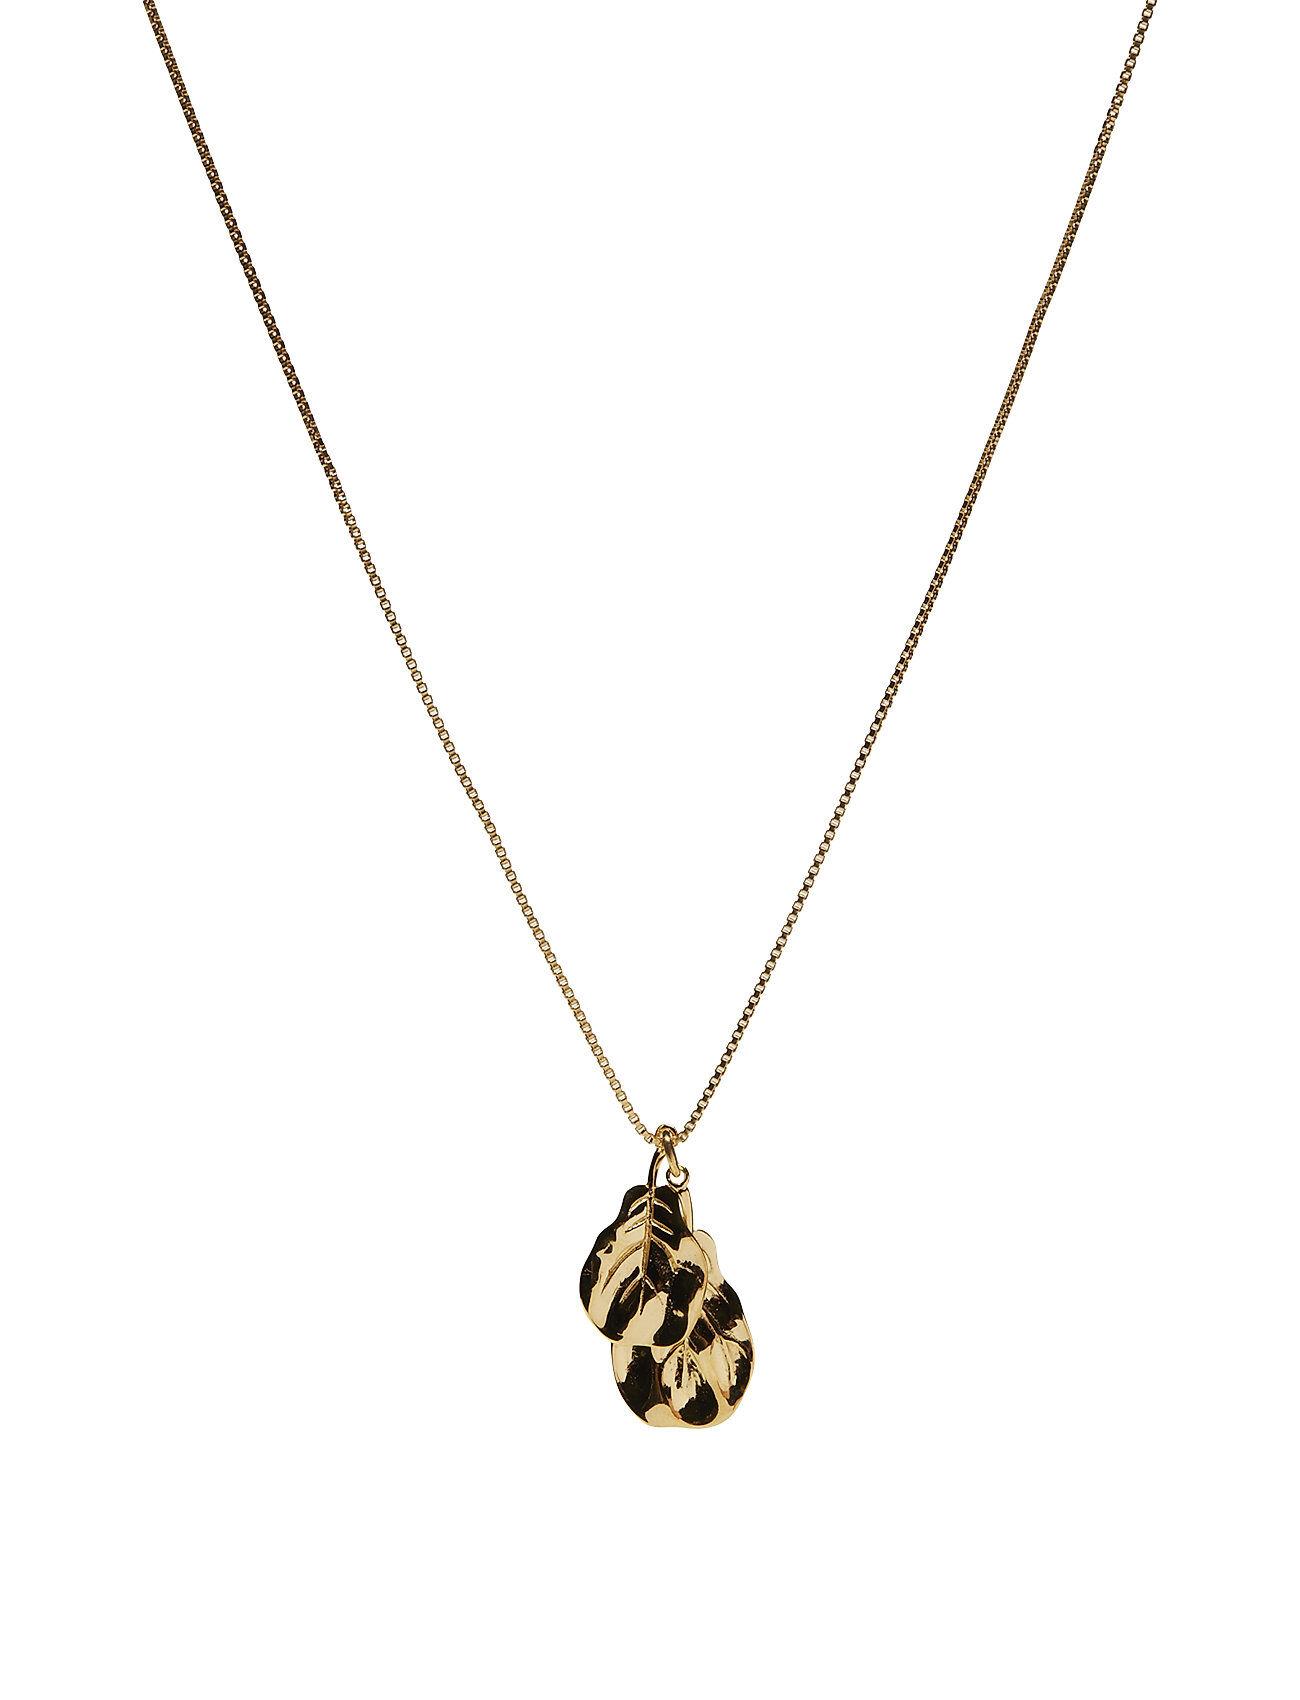 Syster P Botanica Fiddle Leaf Necklace Gold